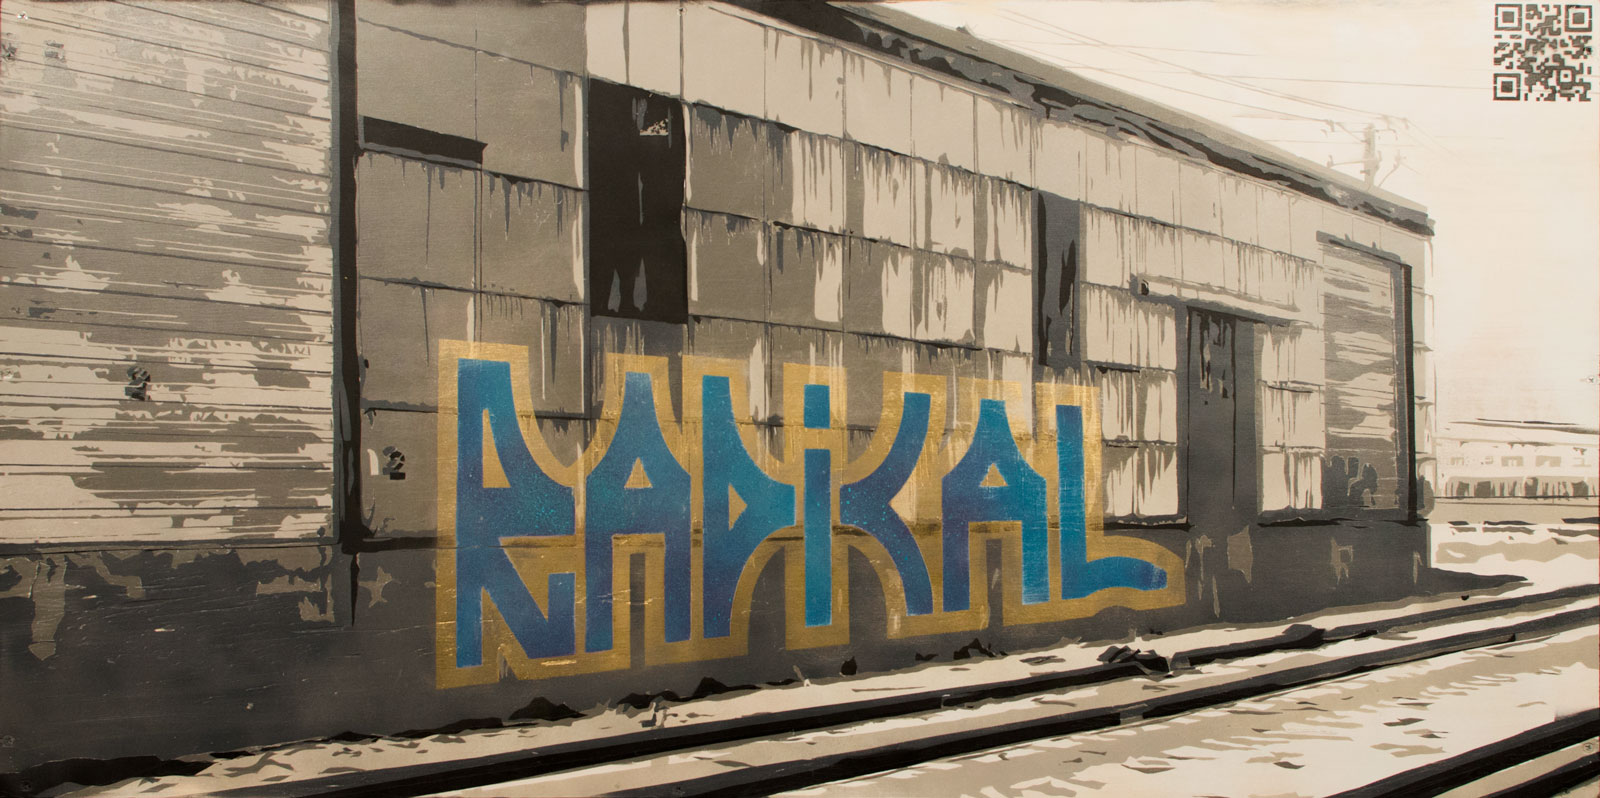 Train Yard Graffiti